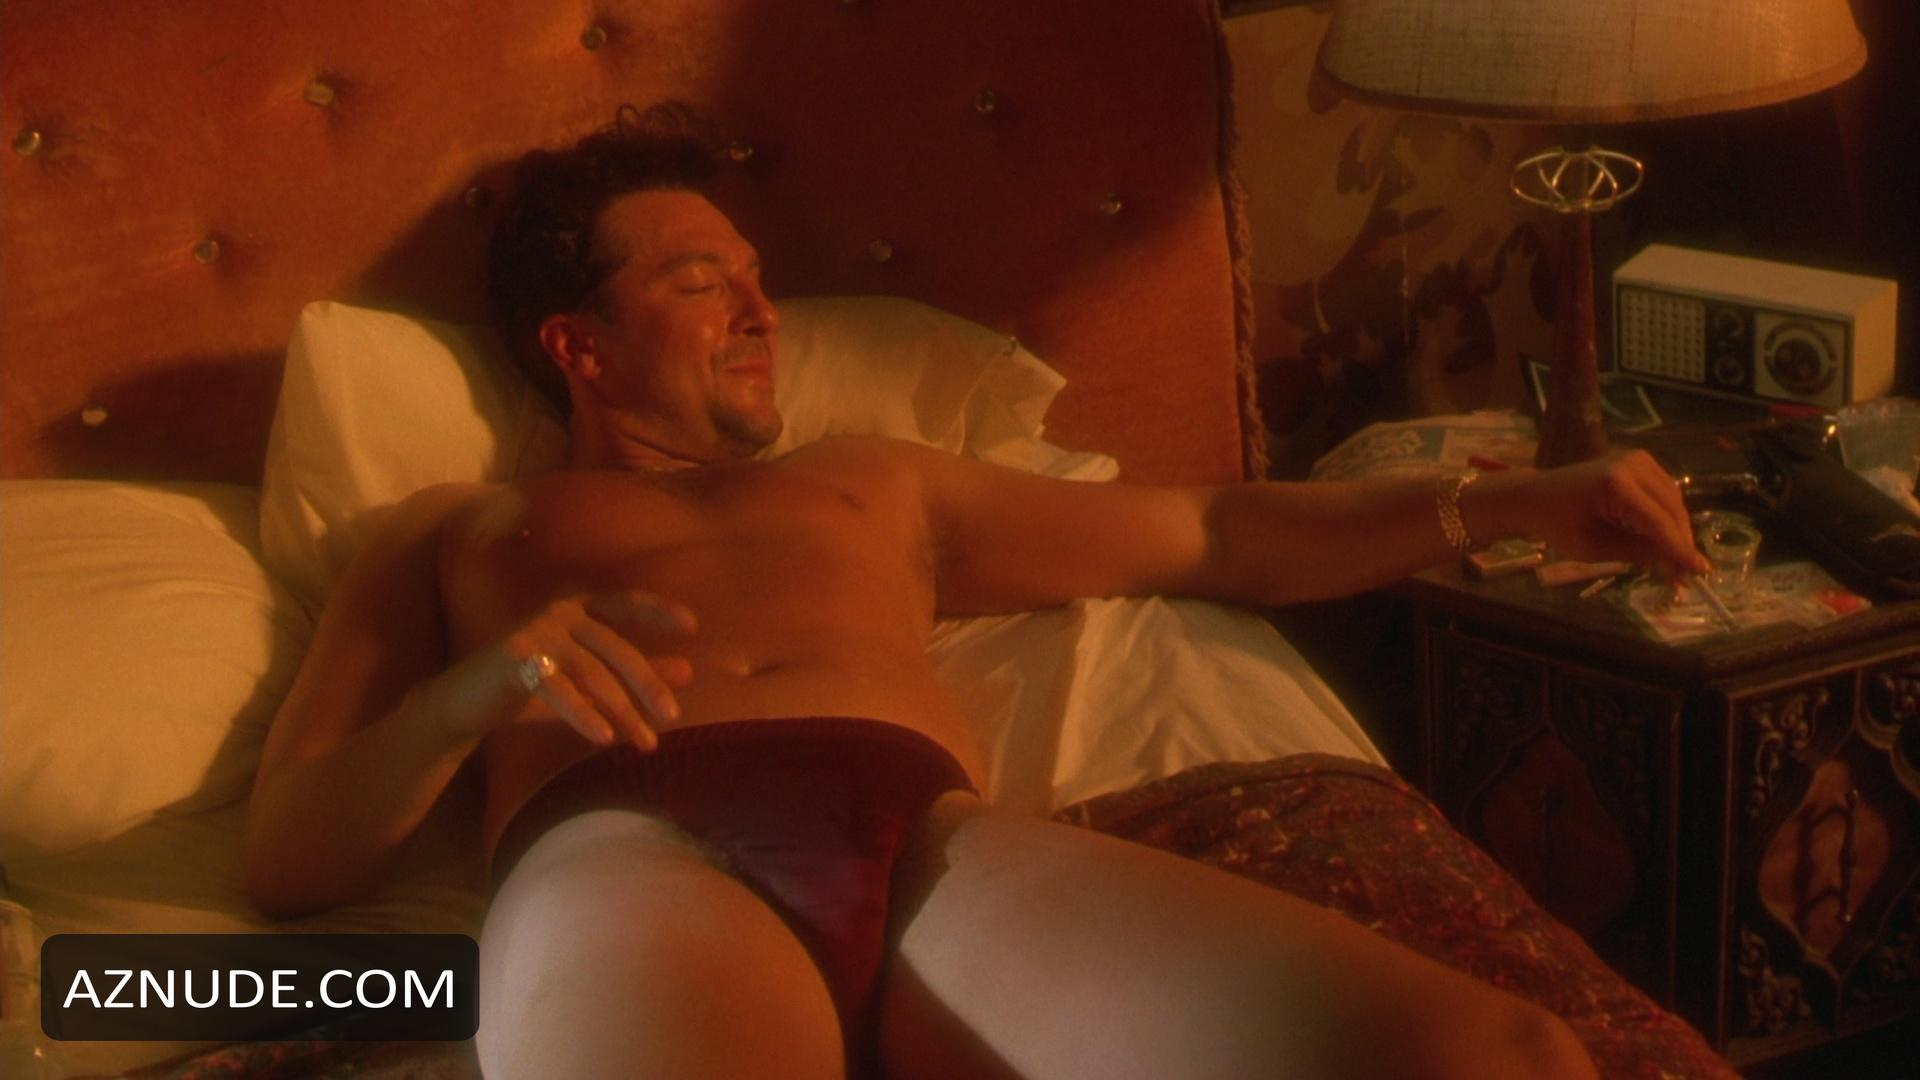 Tom sizemore naked